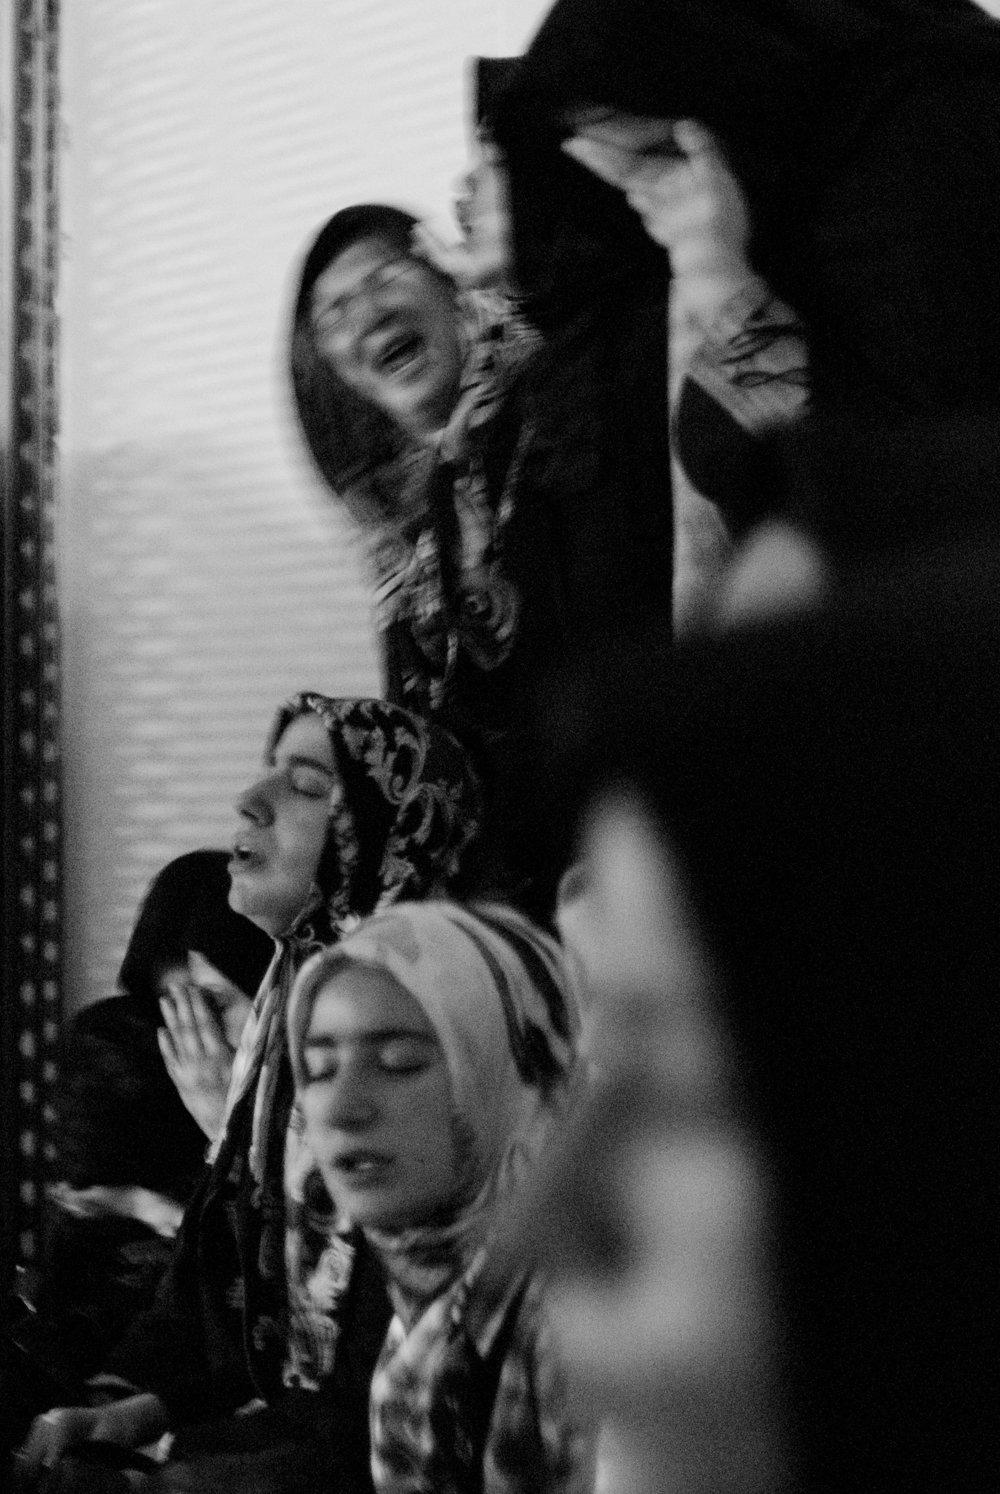 041809_SufiWomen_pi_03_CROPPED.jpg